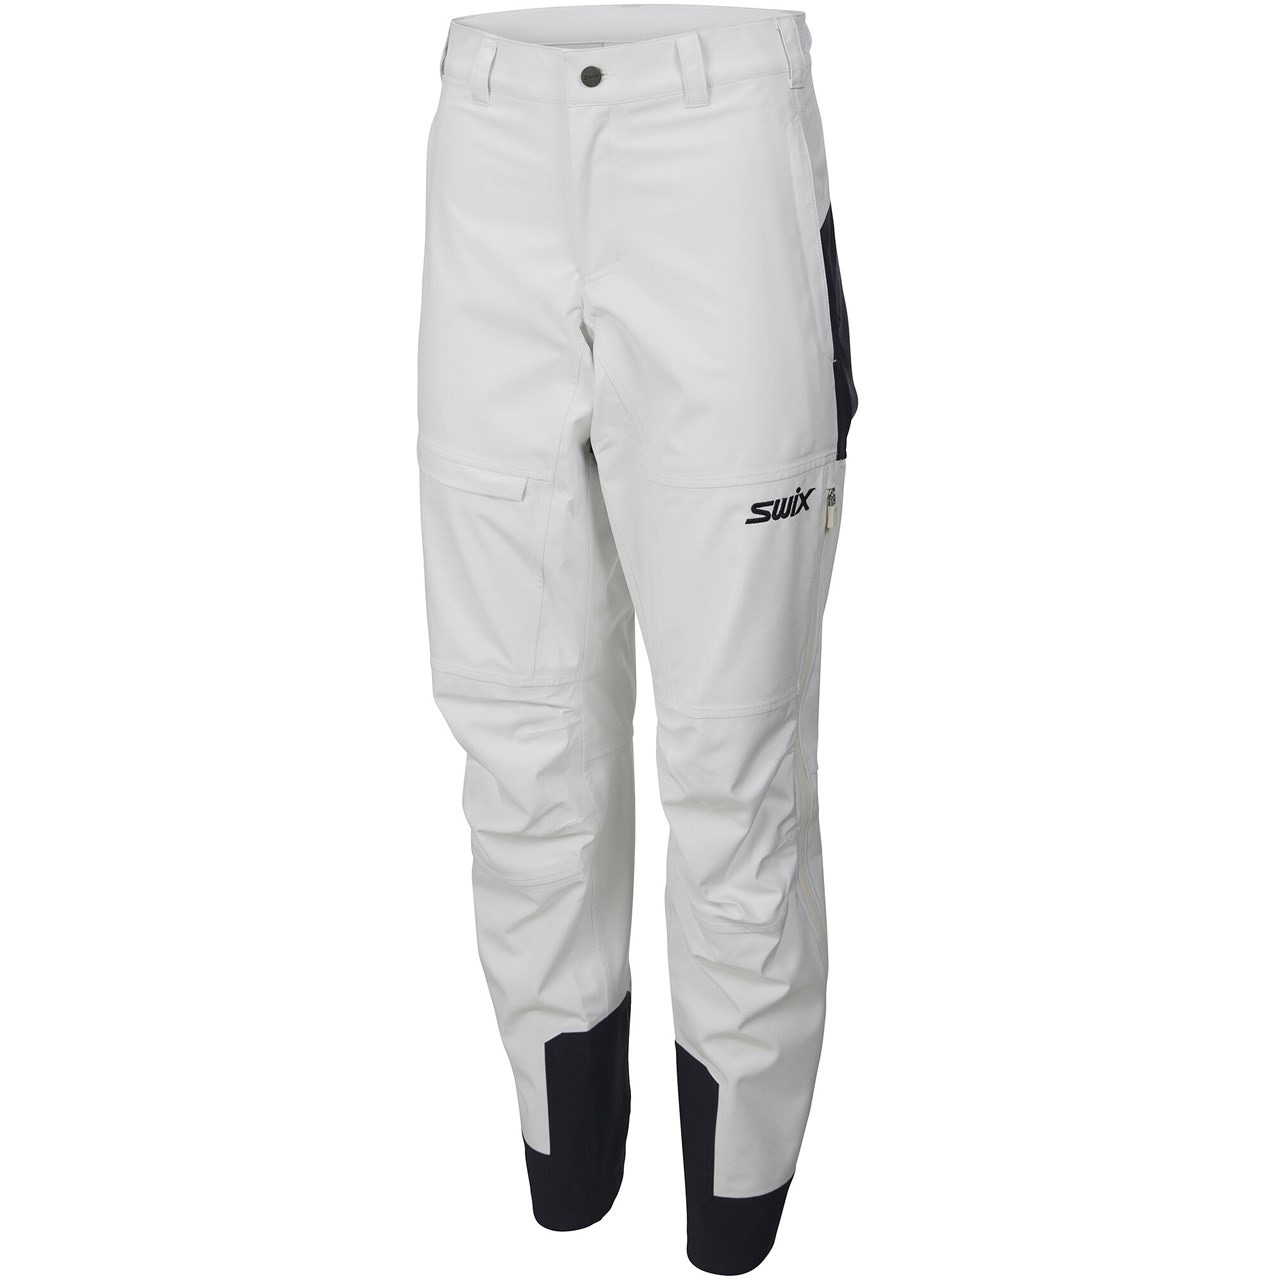 Swix Blizzard Pants W's